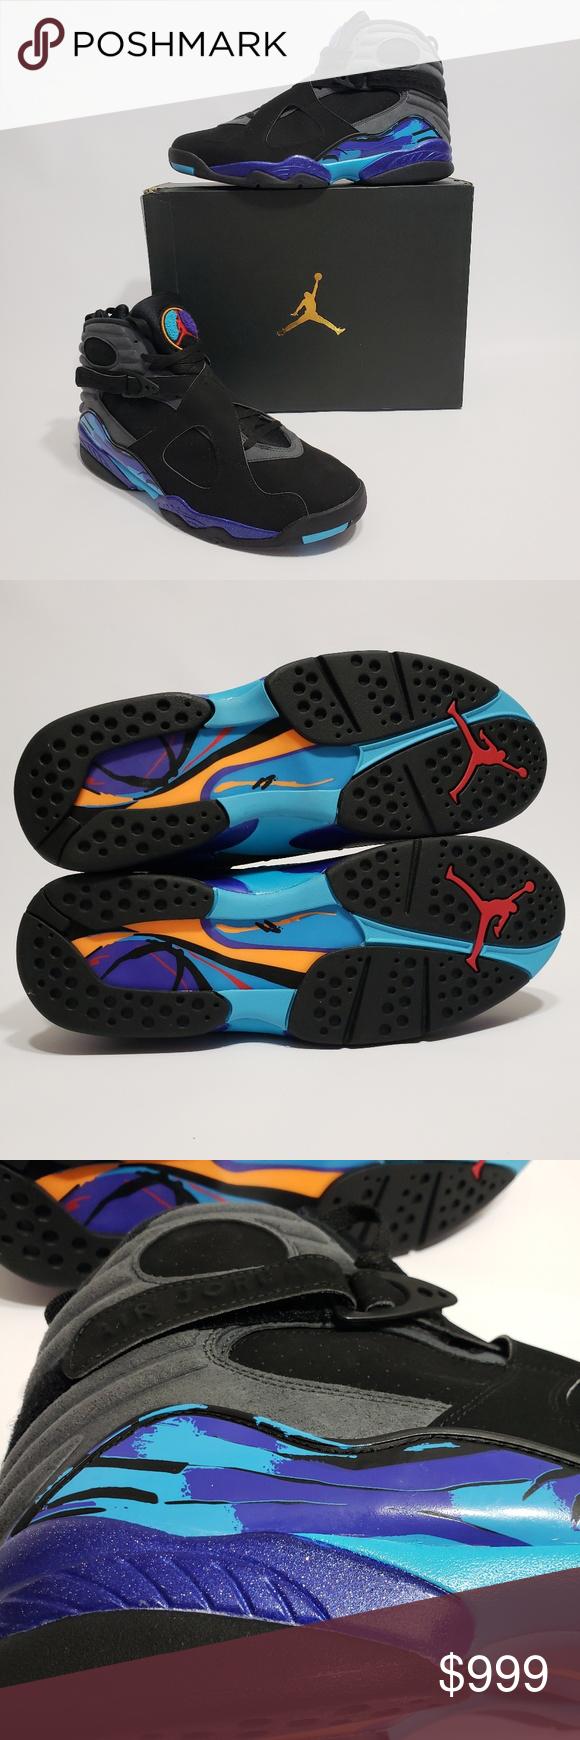 4b33a57084b3 Air Jordan 8 Retro Aqua Men s Size 14 Black Air Jordan 8 Retro Aqua Color   Black Flint Gray Bright Concord Size  14 Condition  Brand new in box Jordan  Shoes ...